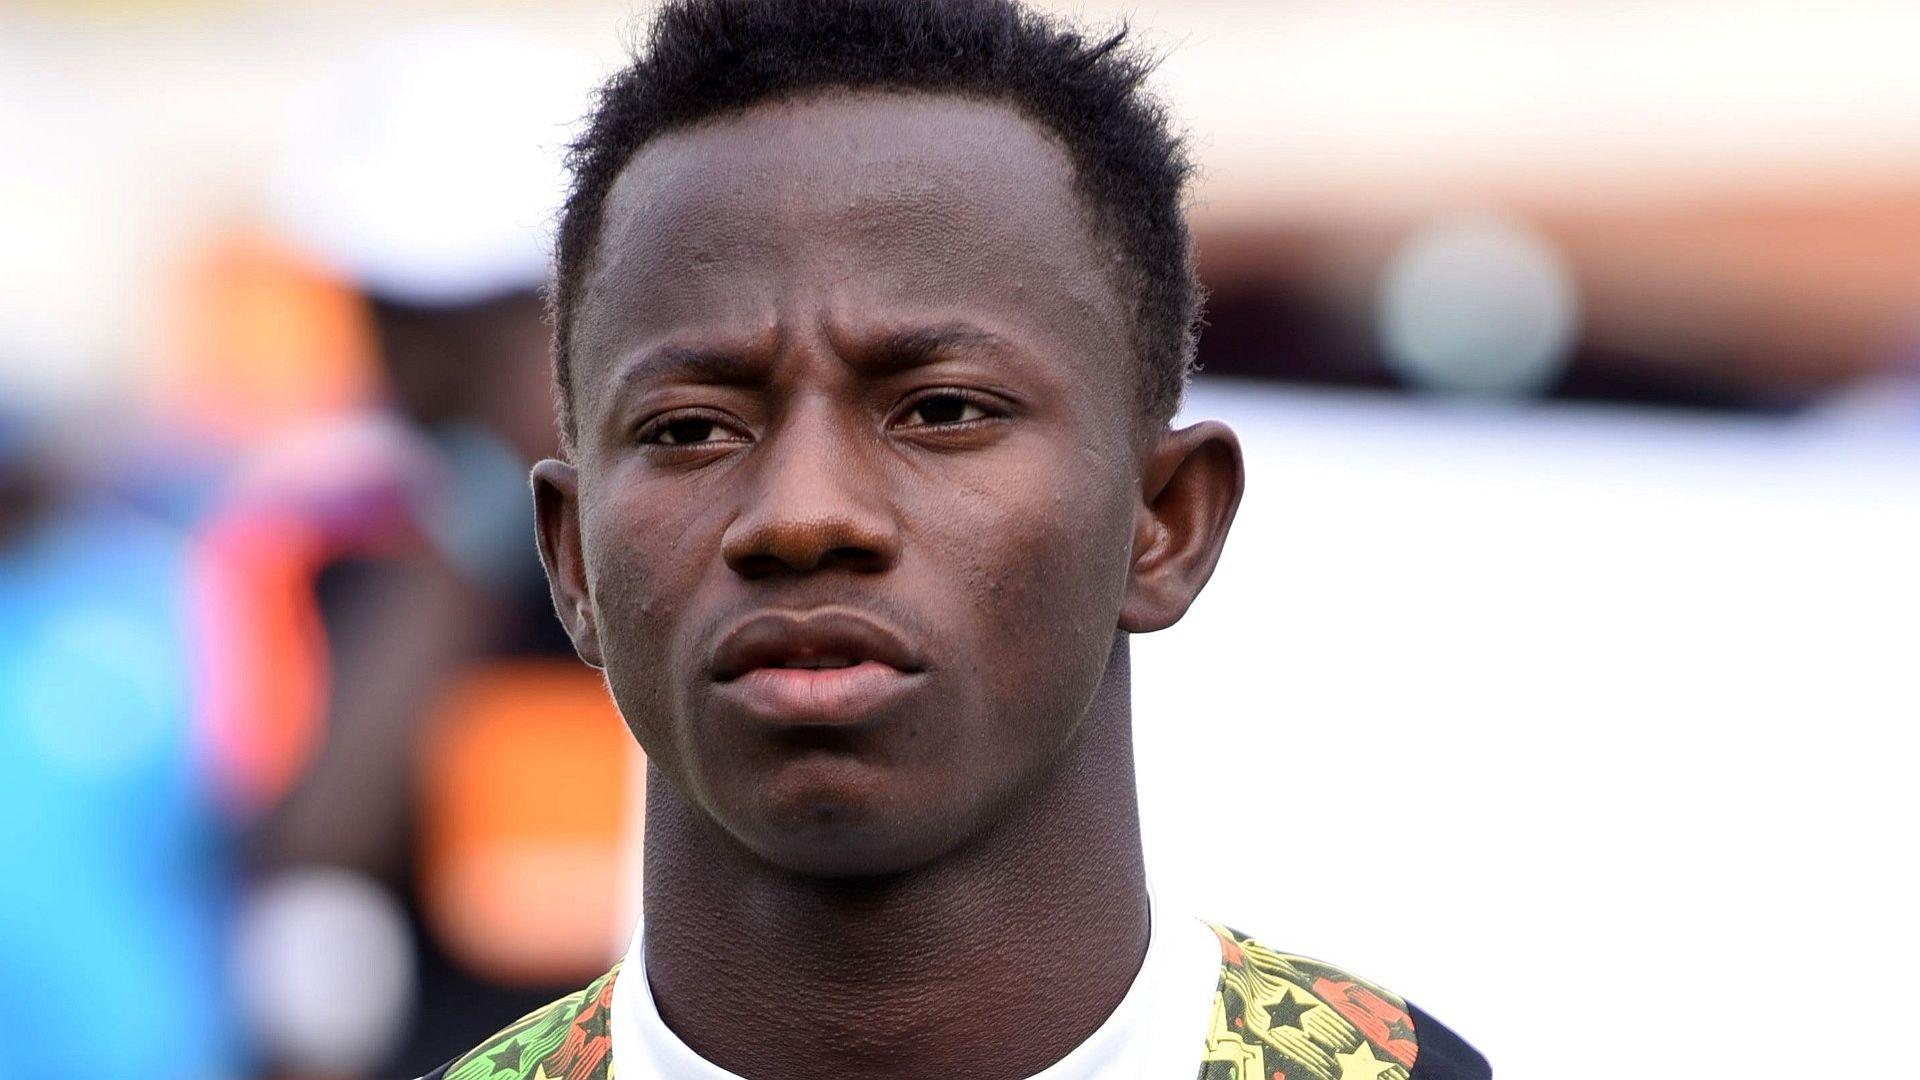 Ghana U-23 star Yaw Yeboah joining Polish side Wisla Krakow